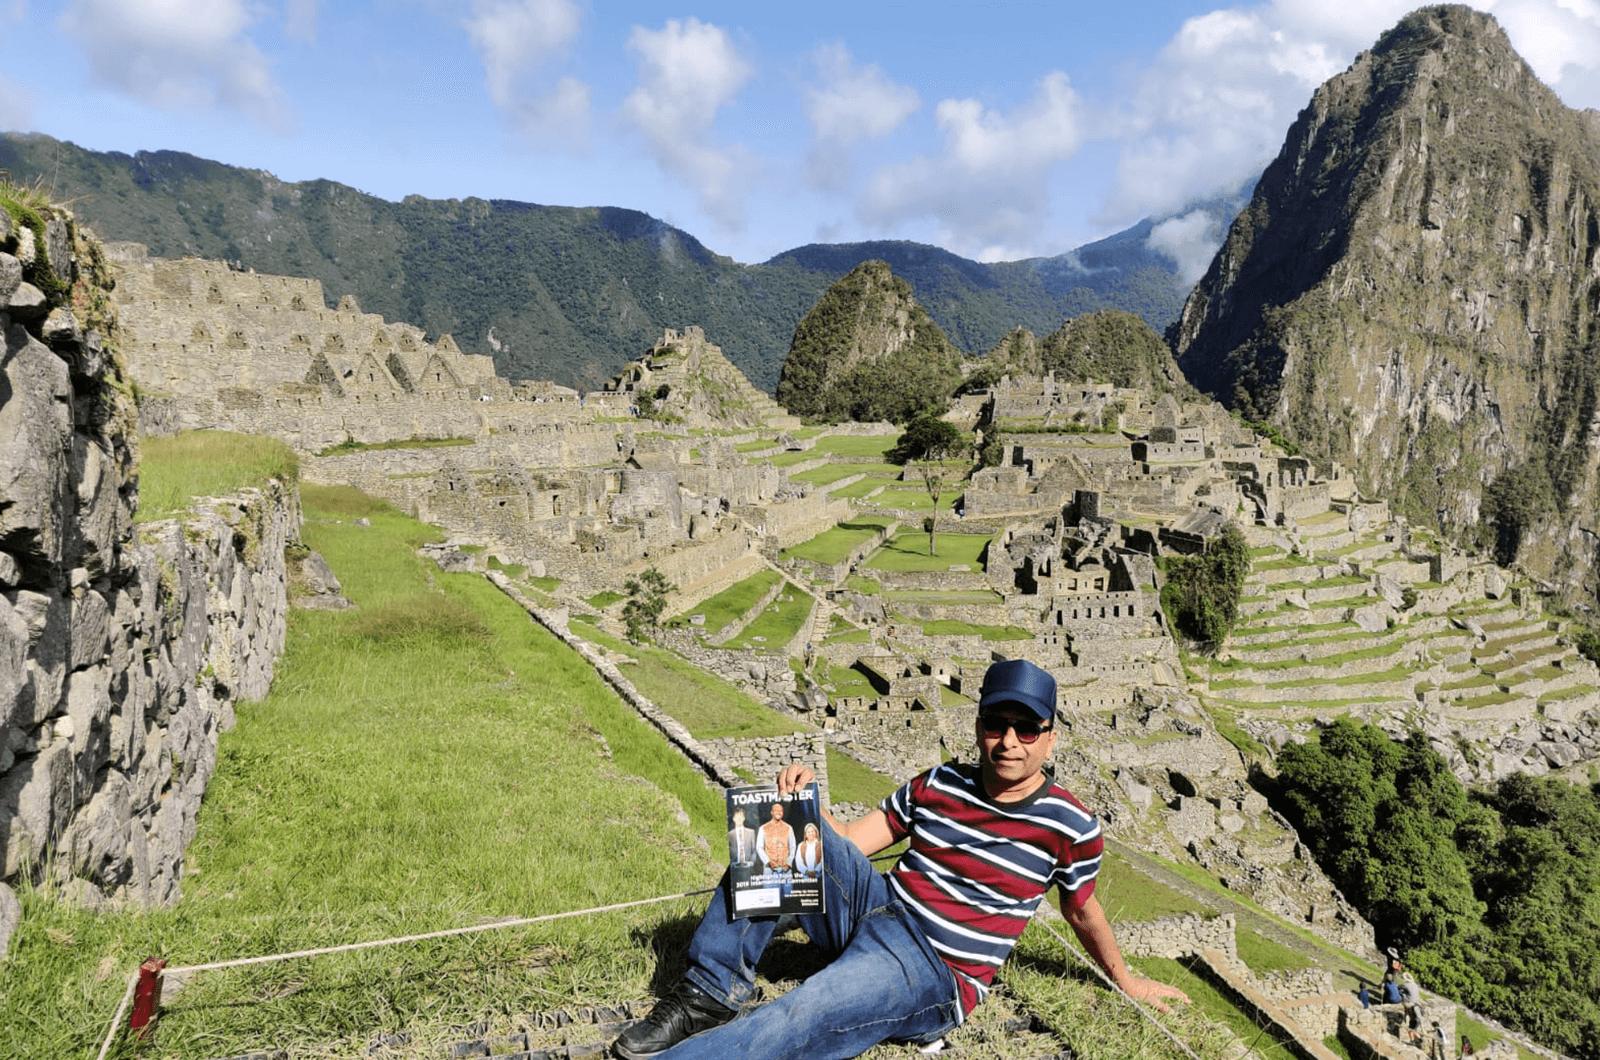 Sam Sukumar of Chicago, Illinois, looks over Machu Picchu while visiting Peru.